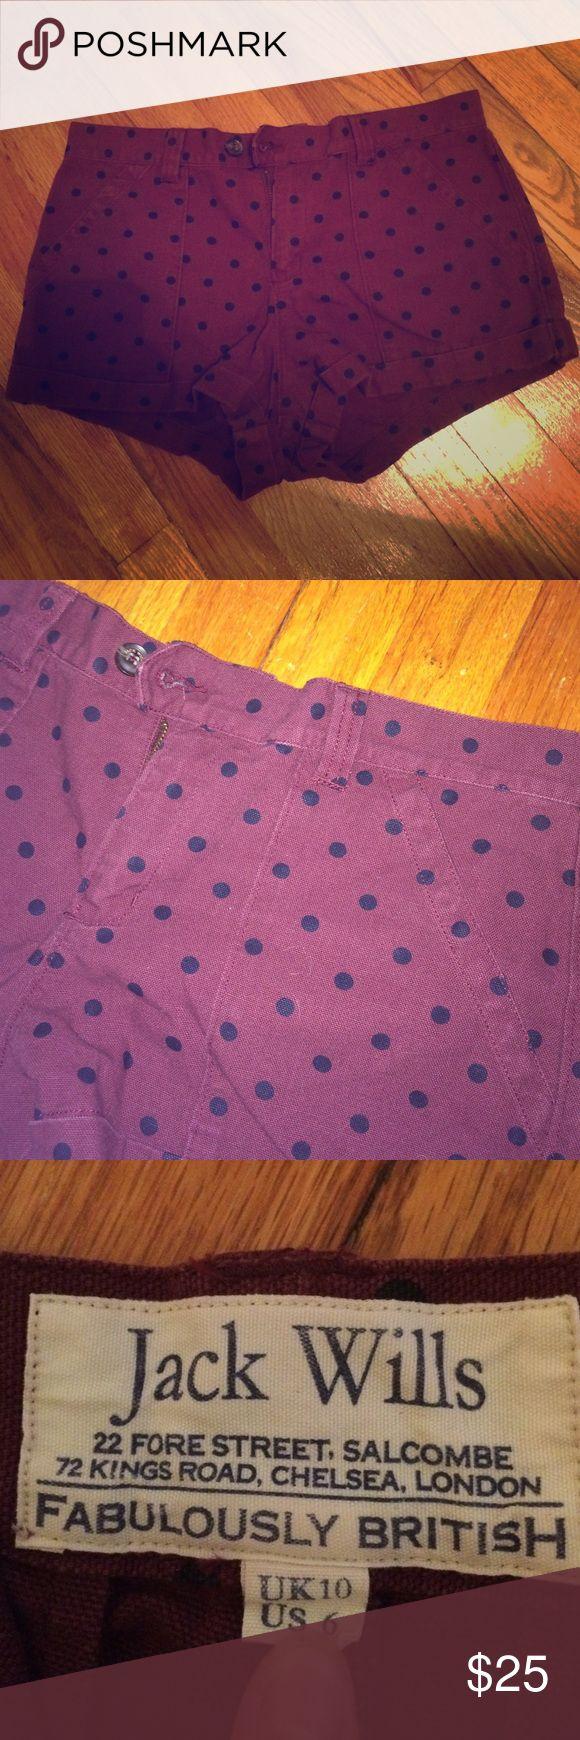 Jack Wills shorts Burgundy with black polka dots jack wills shorts Jack Wills Shorts